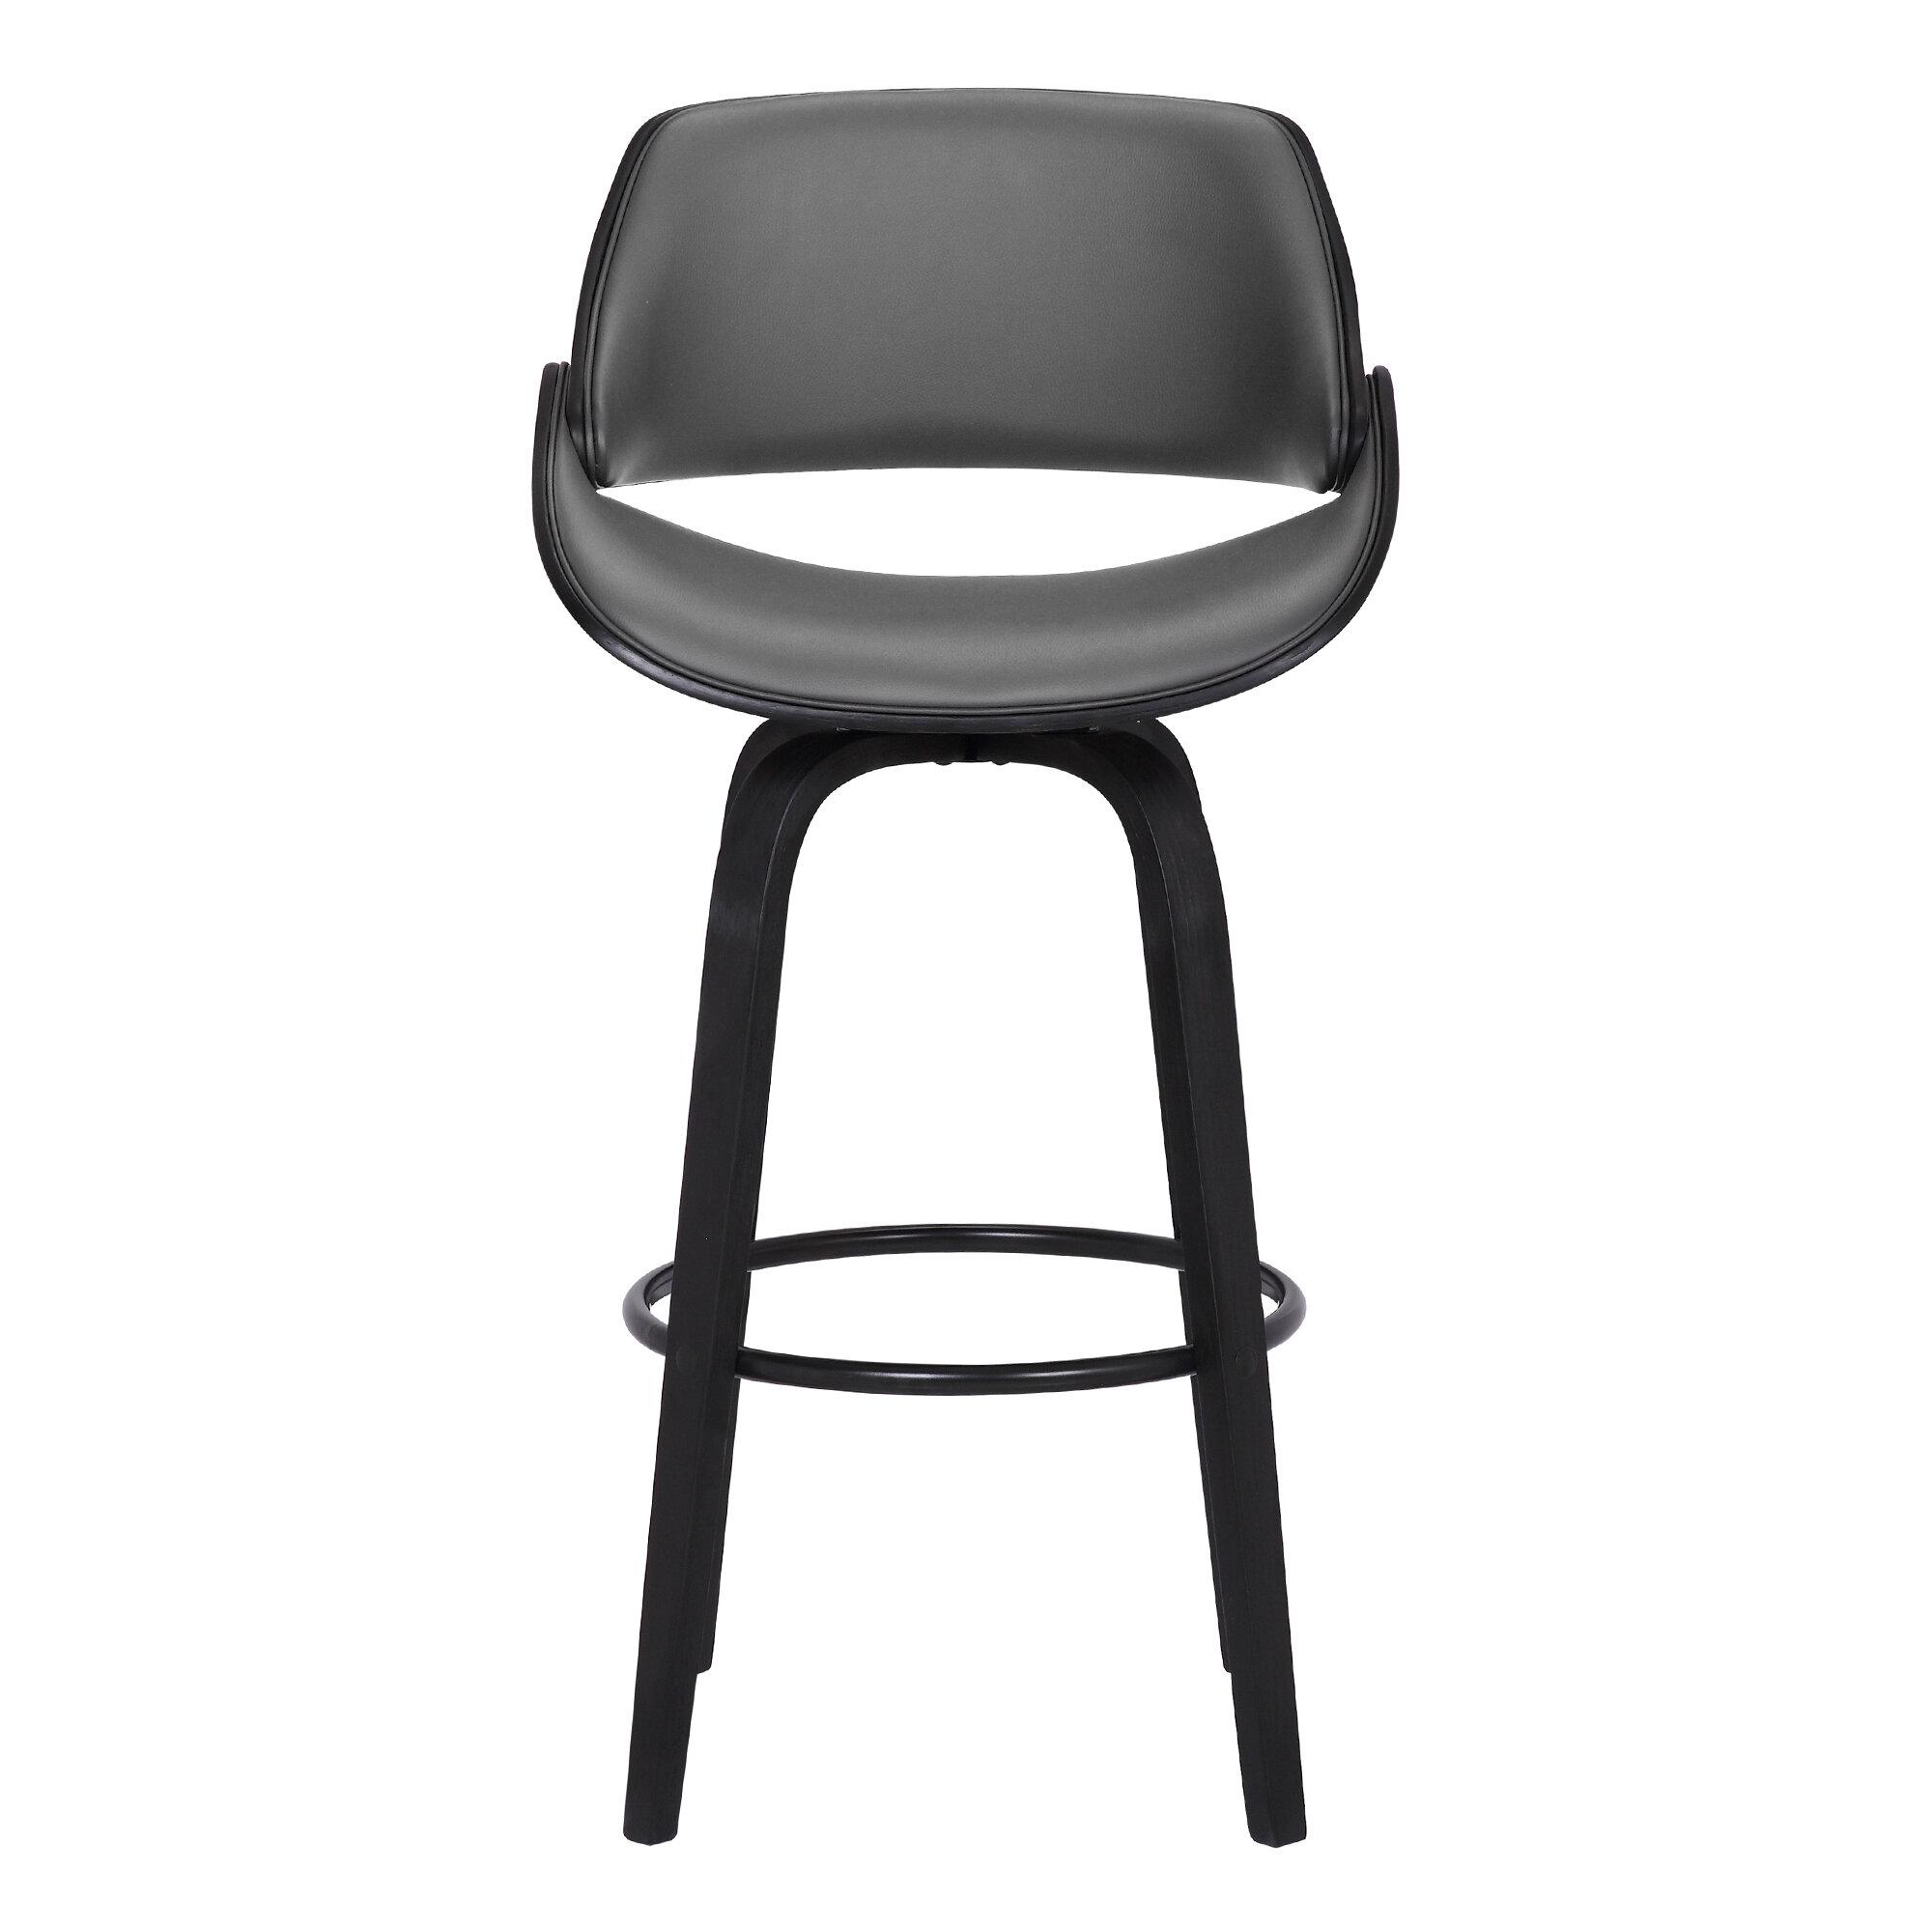 Awe Inspiring Farrish Bar Counter Swivel Stool Bralicious Painted Fabric Chair Ideas Braliciousco